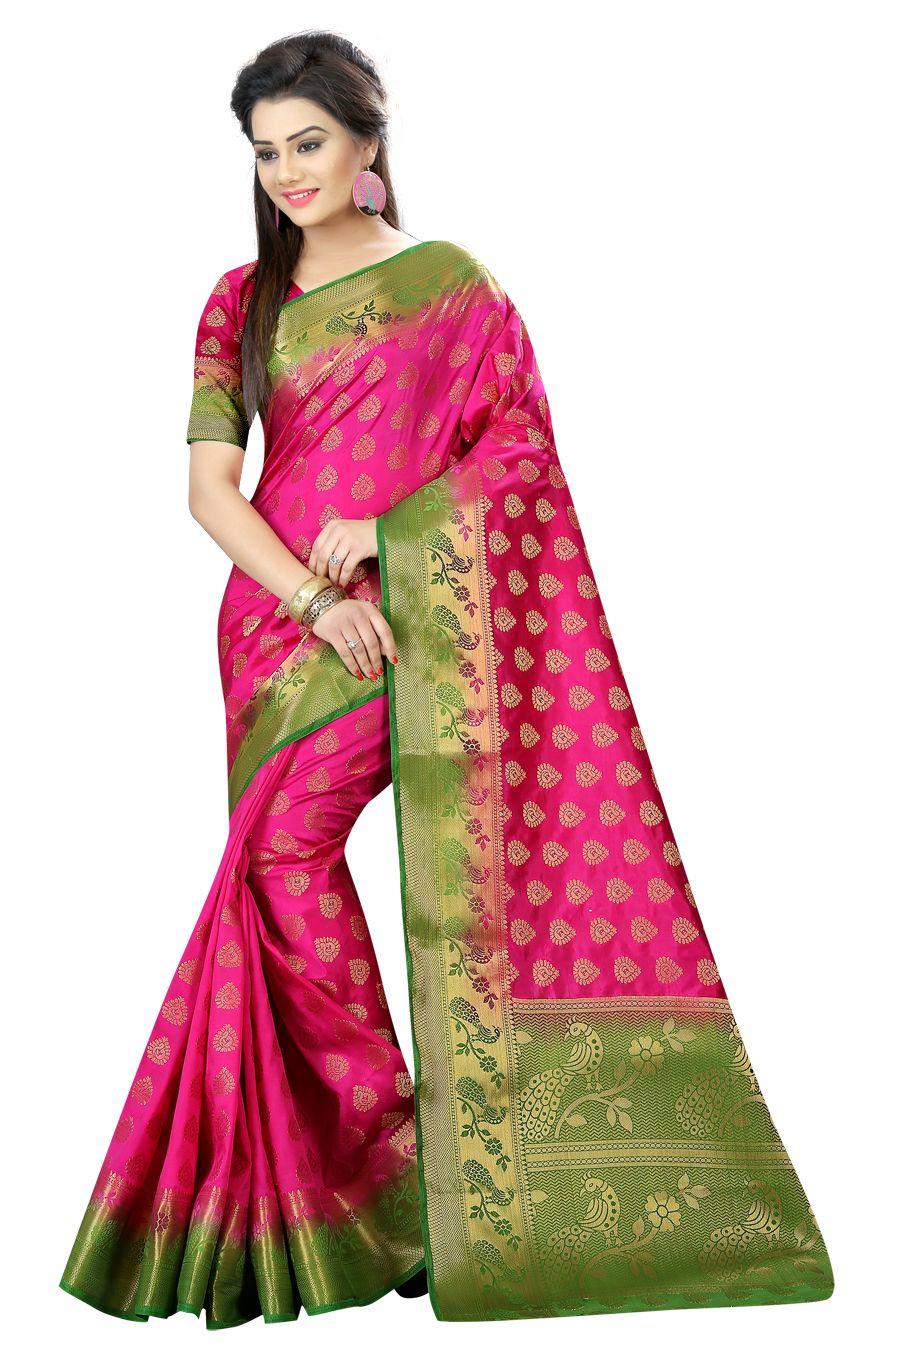 Indian Silk Sari Designer Wedding Party wear Ethnic Trendy Cultural Saree Blouse